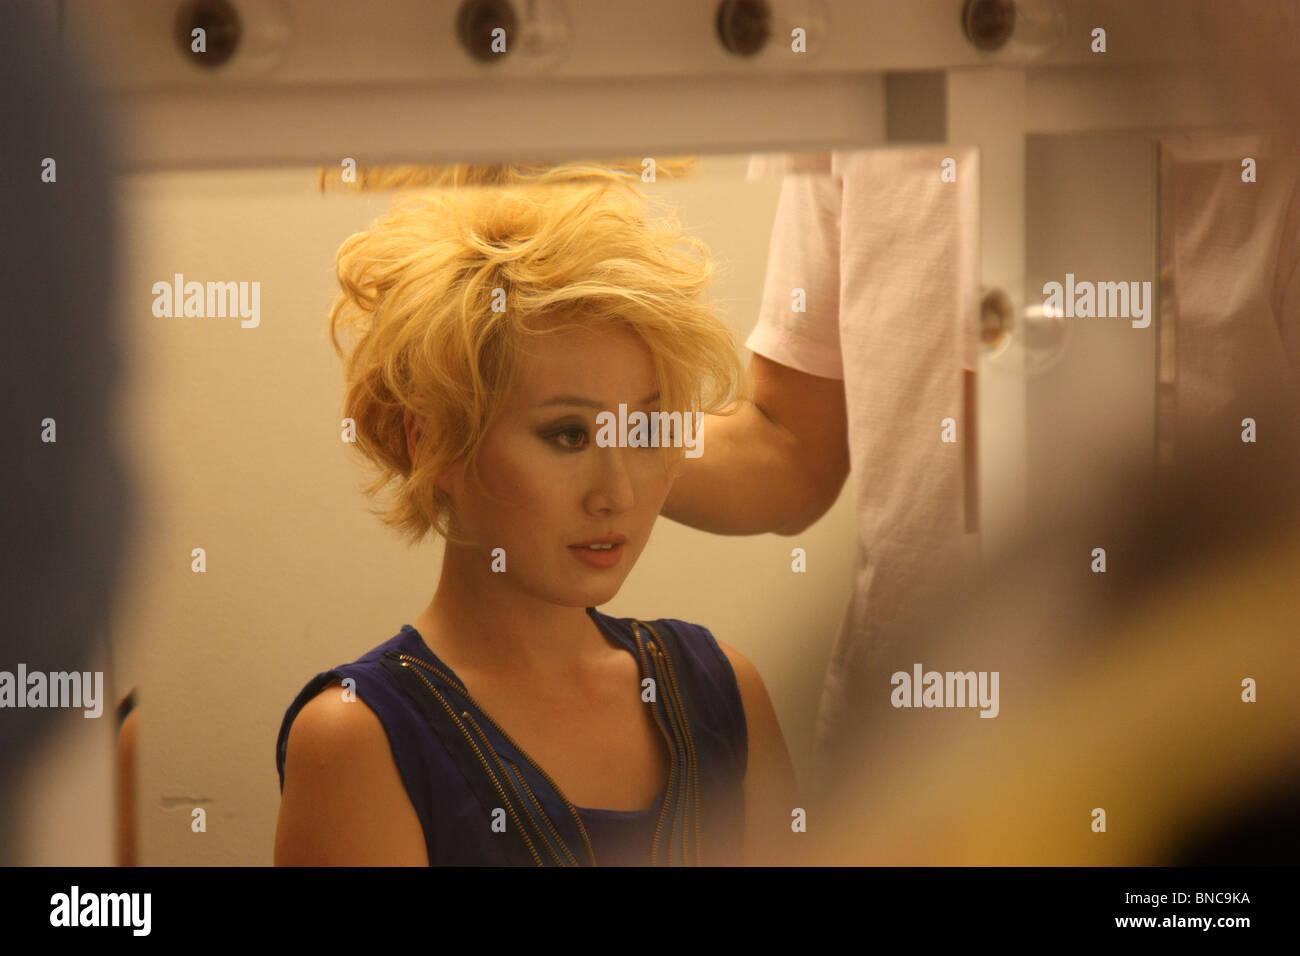 female hair mirror preparing backstage fashion - Stock Image